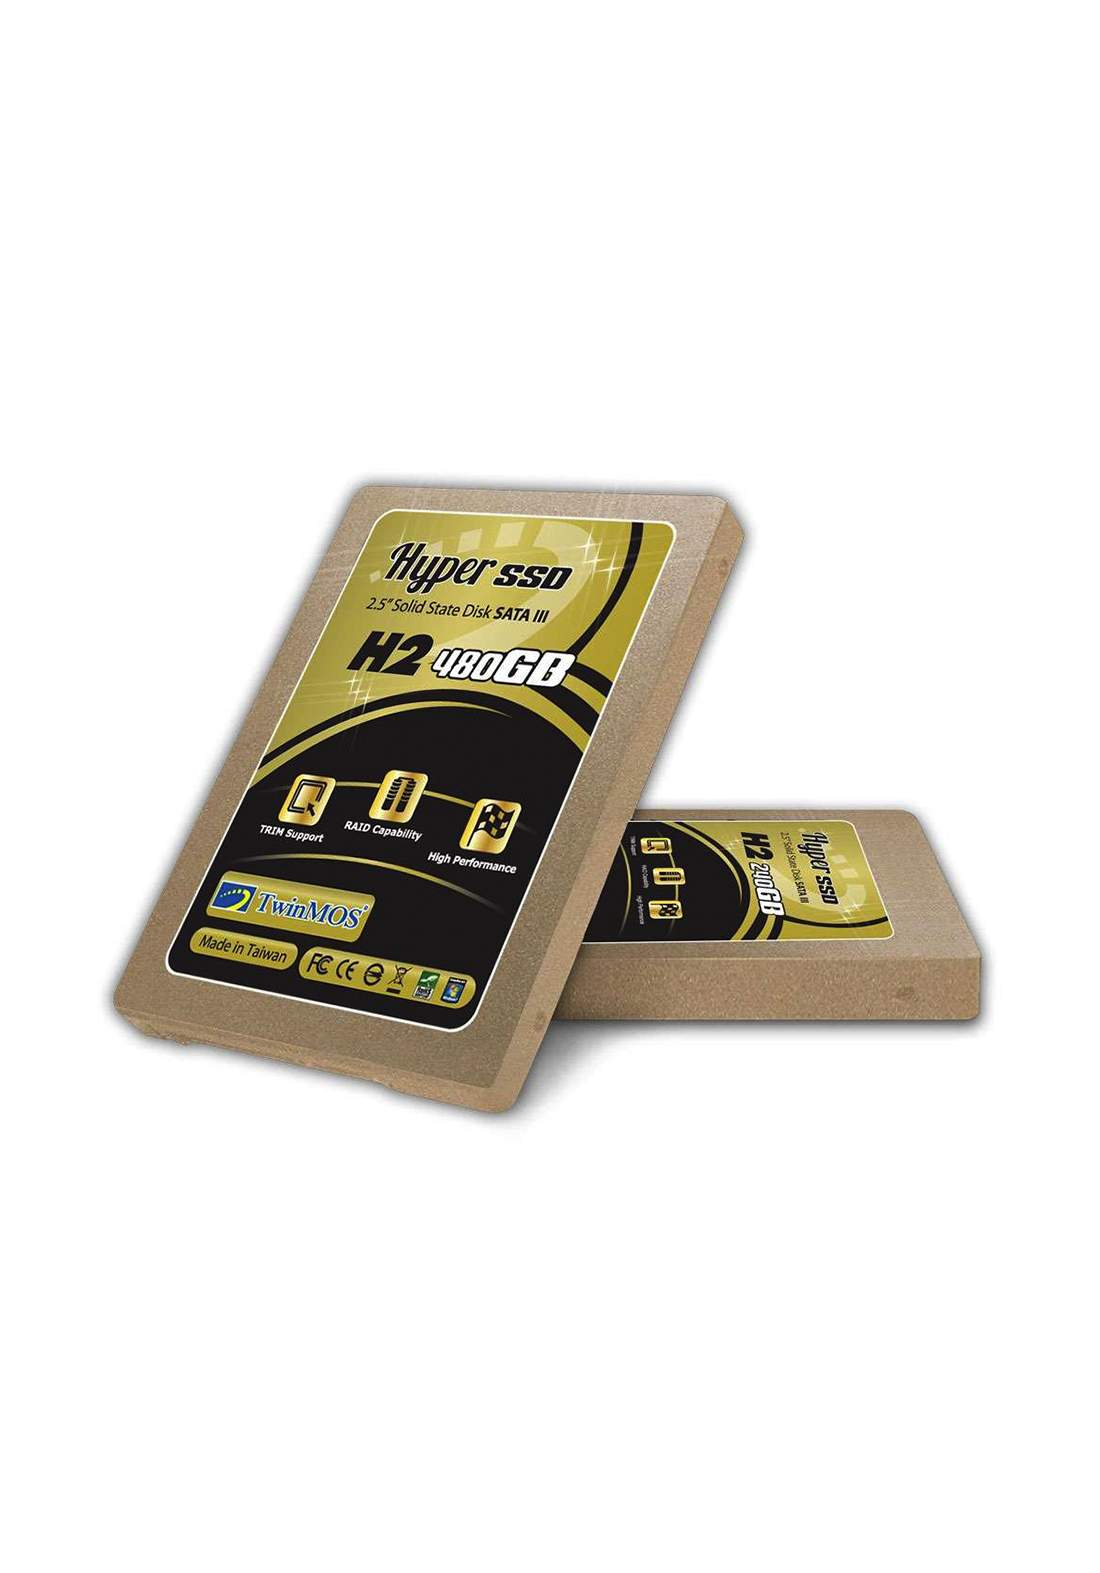 Twinmos Hyper 1TB 2.5 Inch Internal Solid State Drive (SSD)